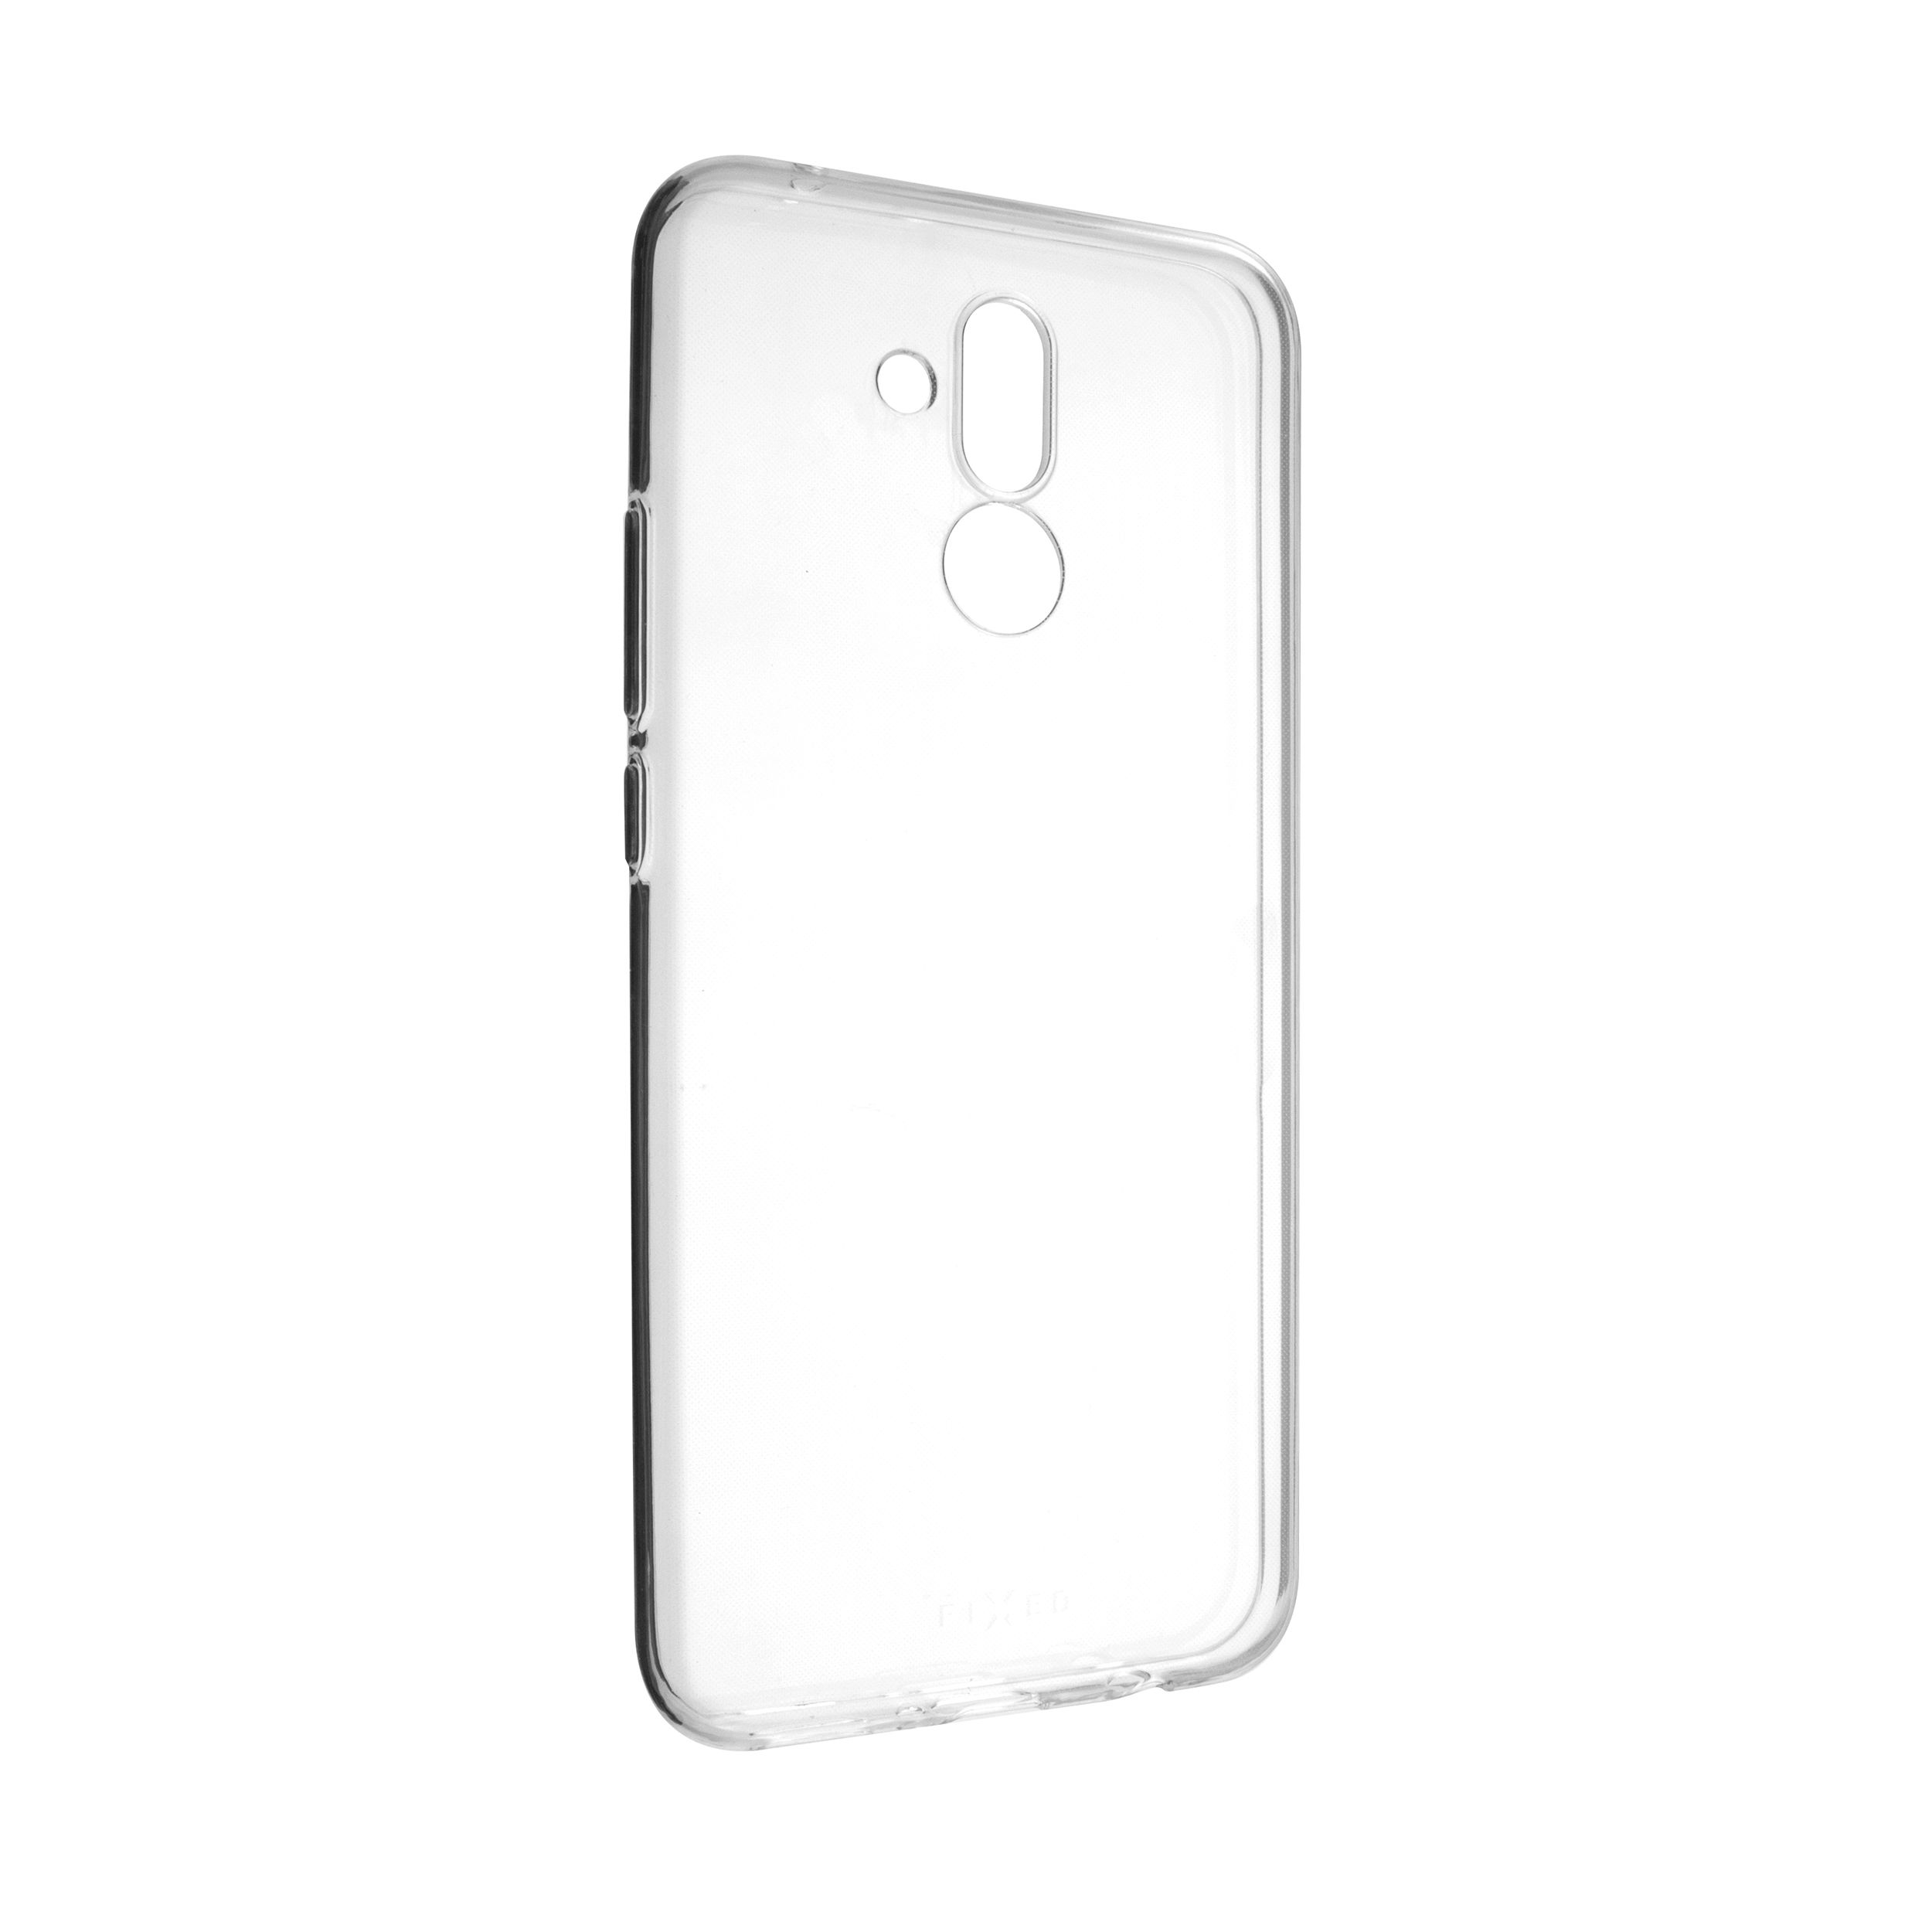 Ultratenké TPU gelové pouzdro FIXED Skin pro Huawei Mate 20 Lite, 0,6 mm, čiré